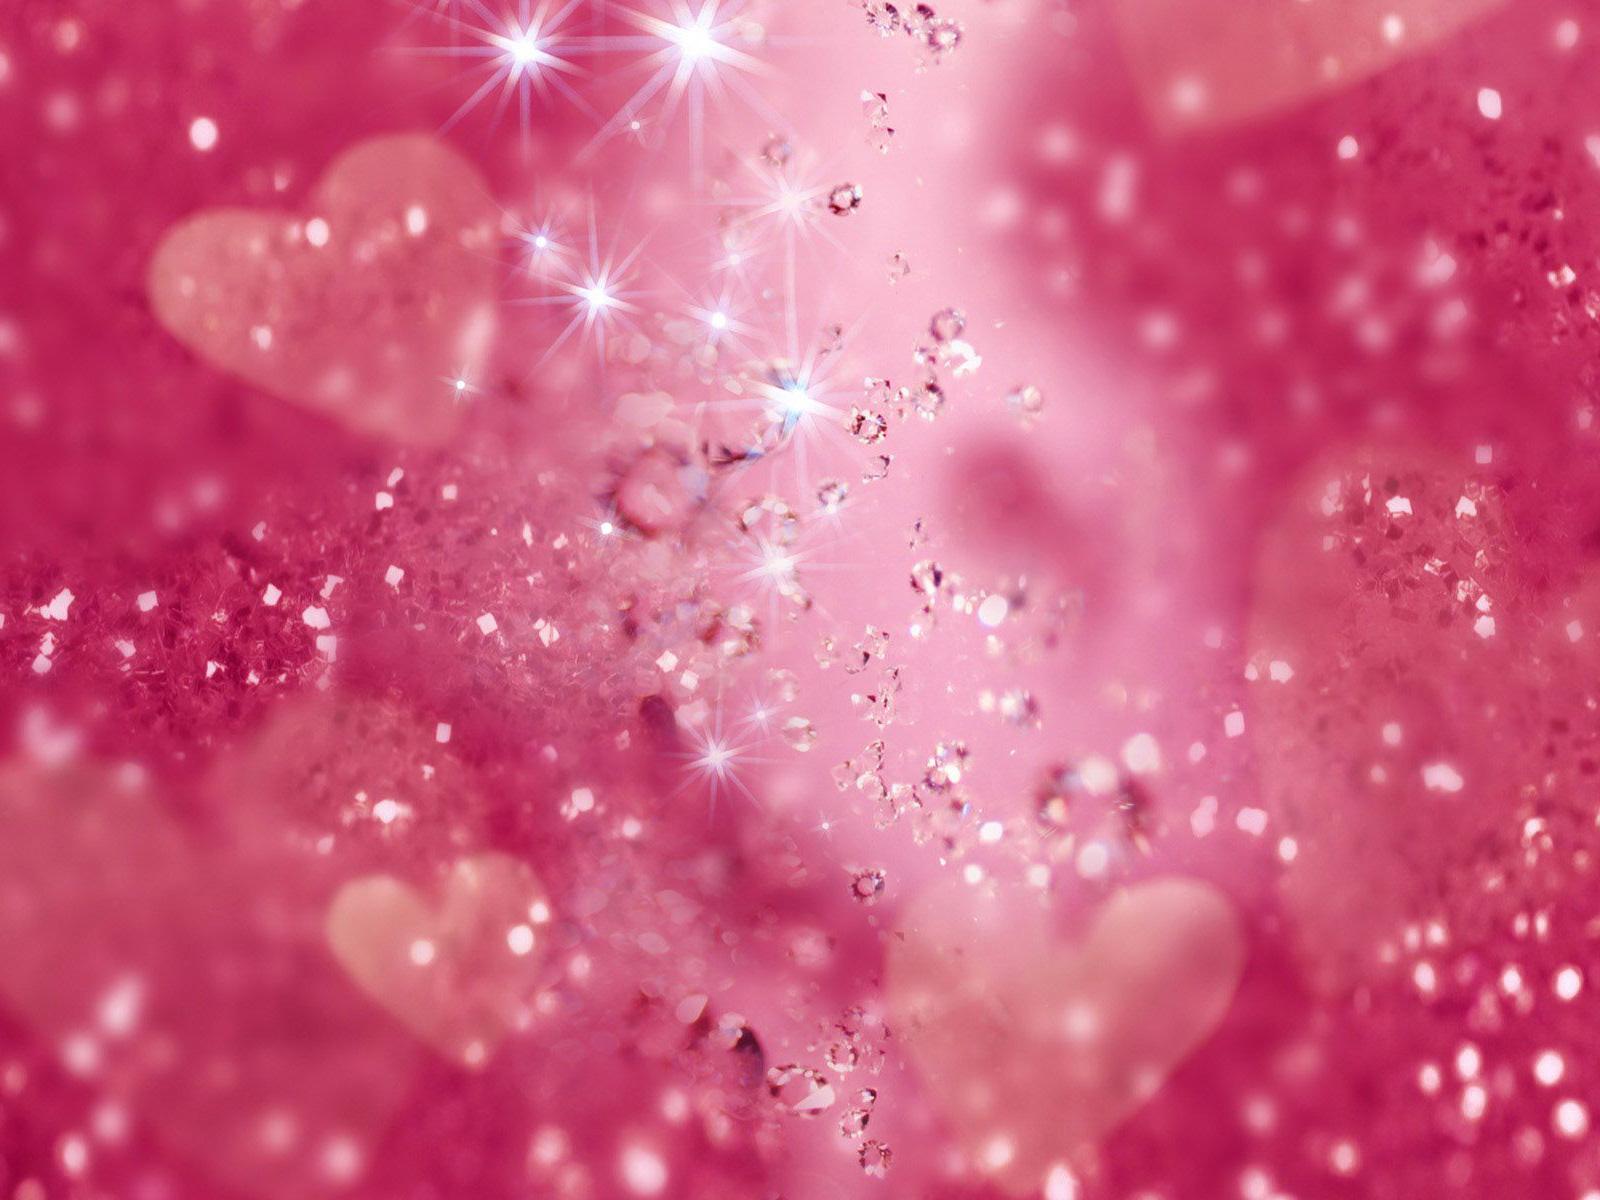 http://1.bp.blogspot.com/-Nm0xJaRovnQ/TkrTQkuIQyI/AAAAAAAADbU/yIuggZ6jkCg/s1600/Pink+wallpaper+desktop+2.jpg